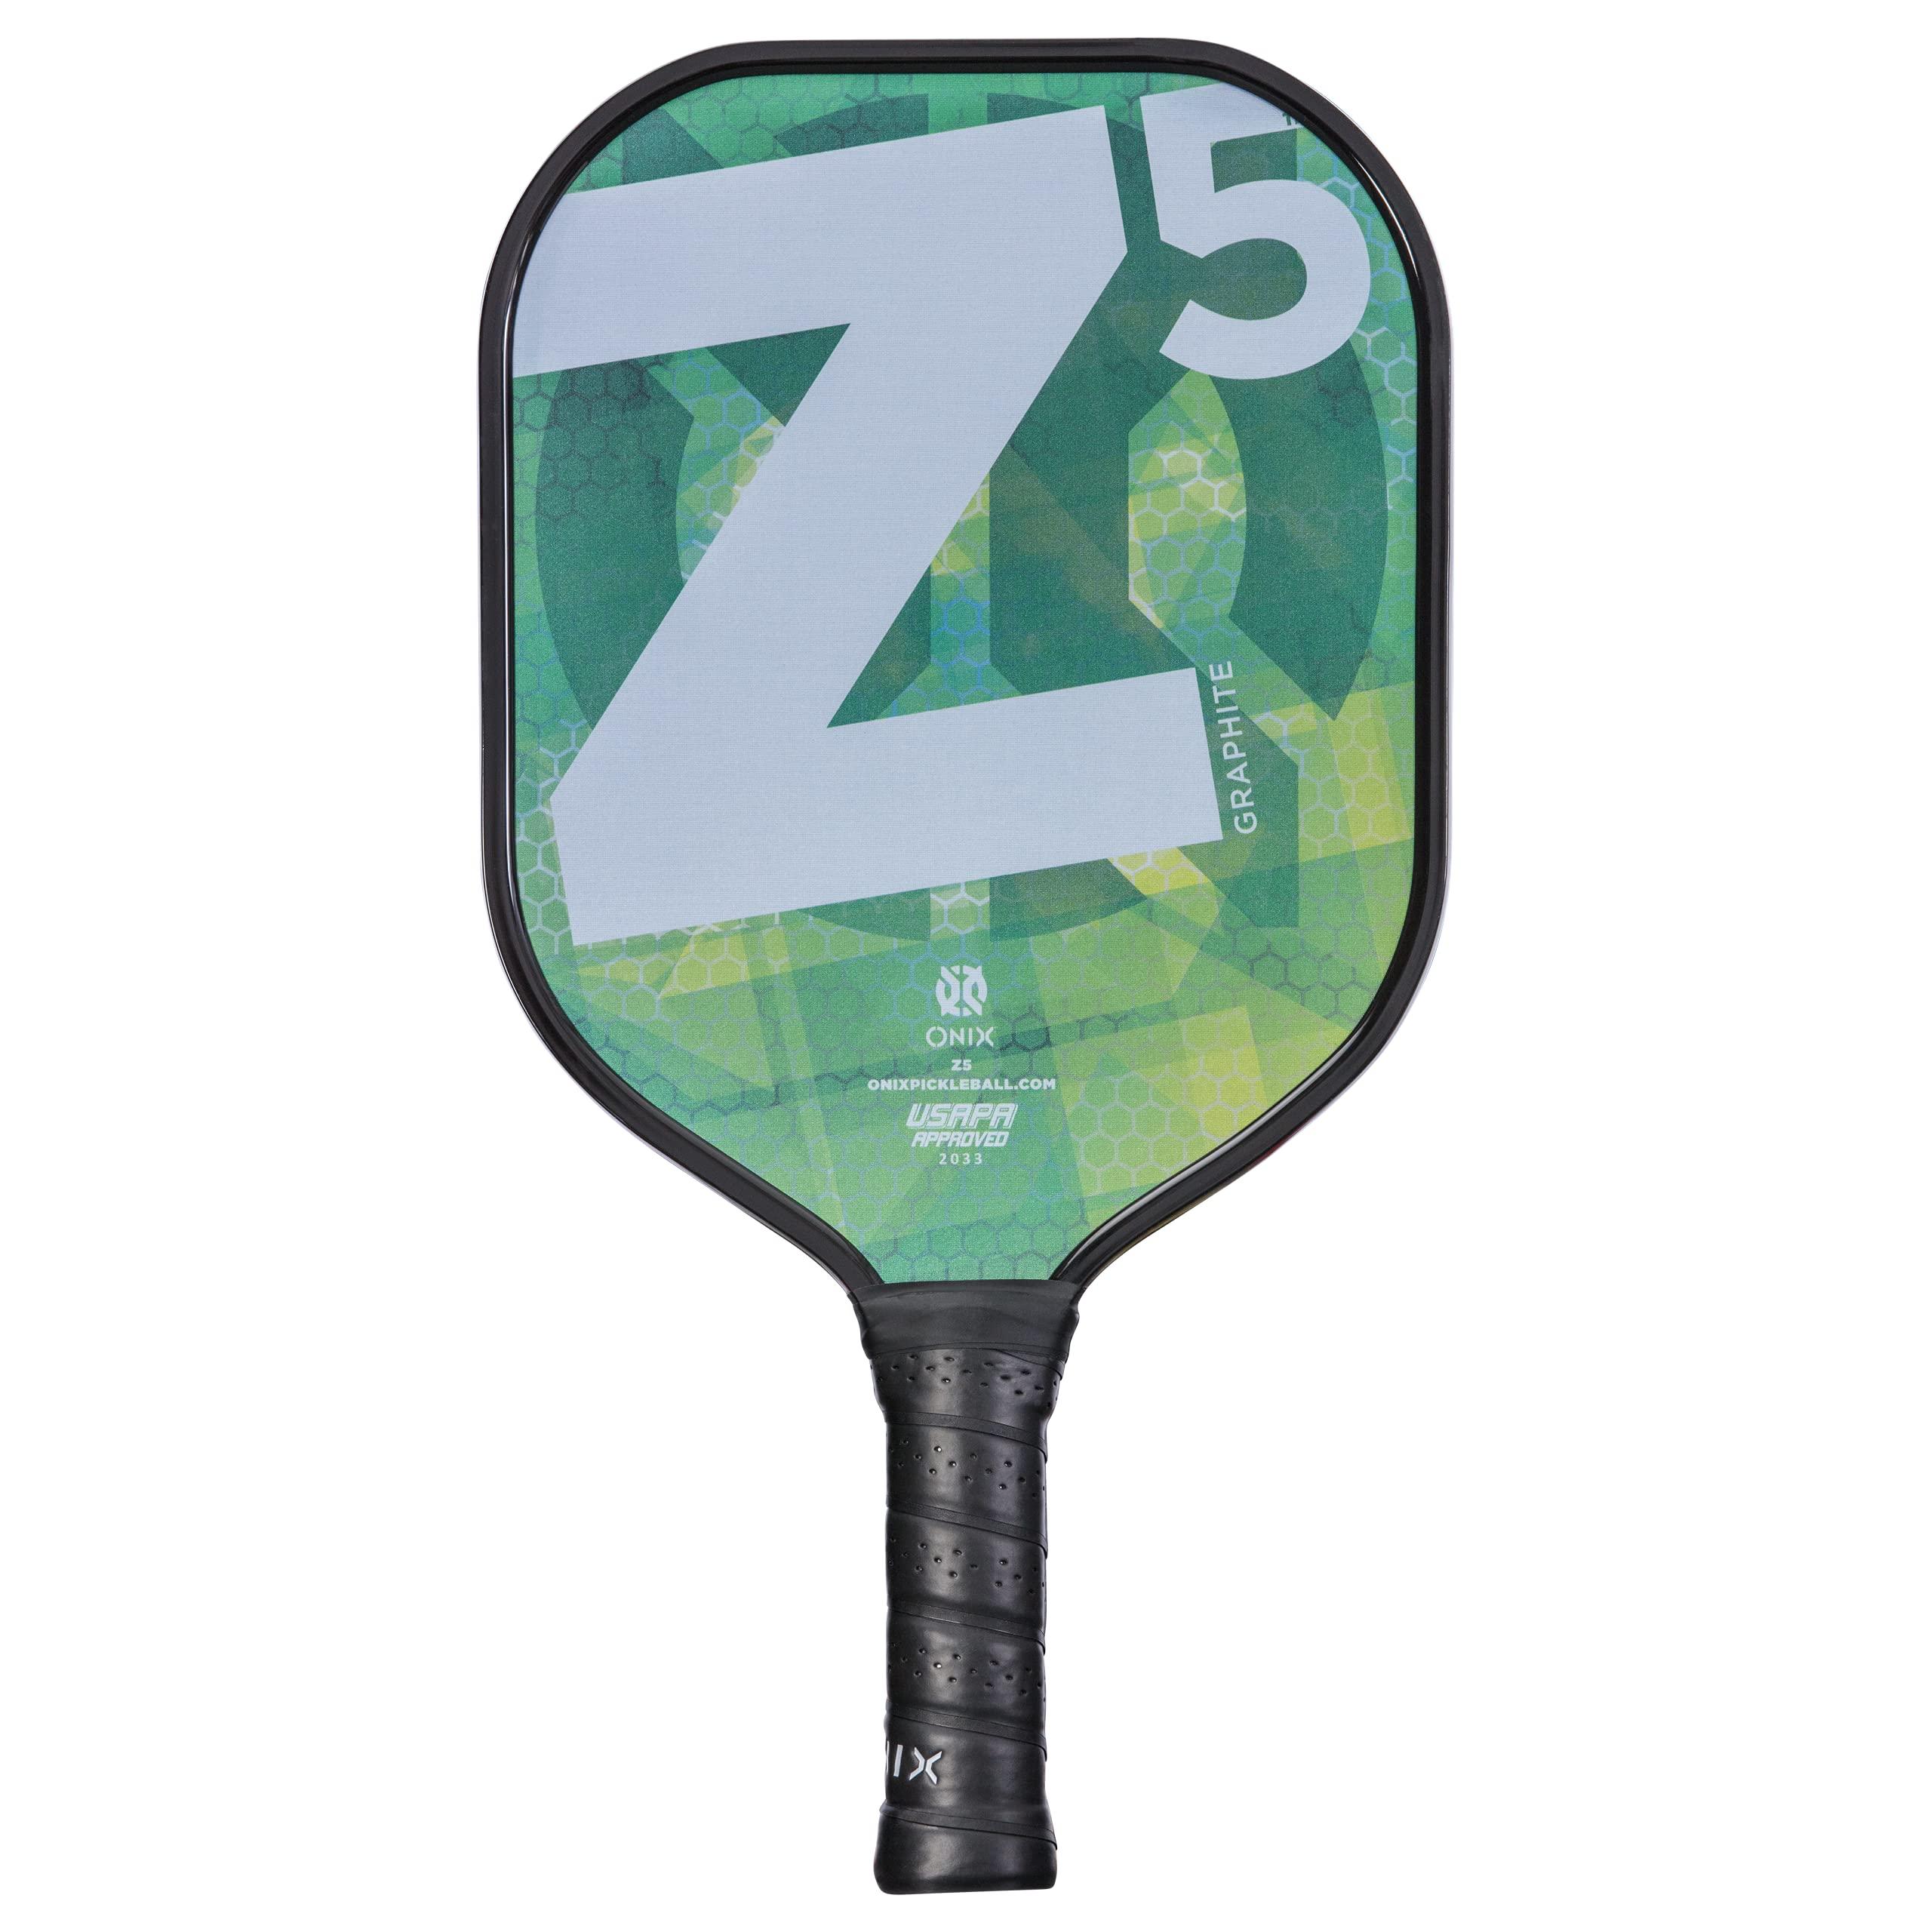 ONIX Graphite Z5 Graphite Carbon Fiber Pickleball Padd -DLSD